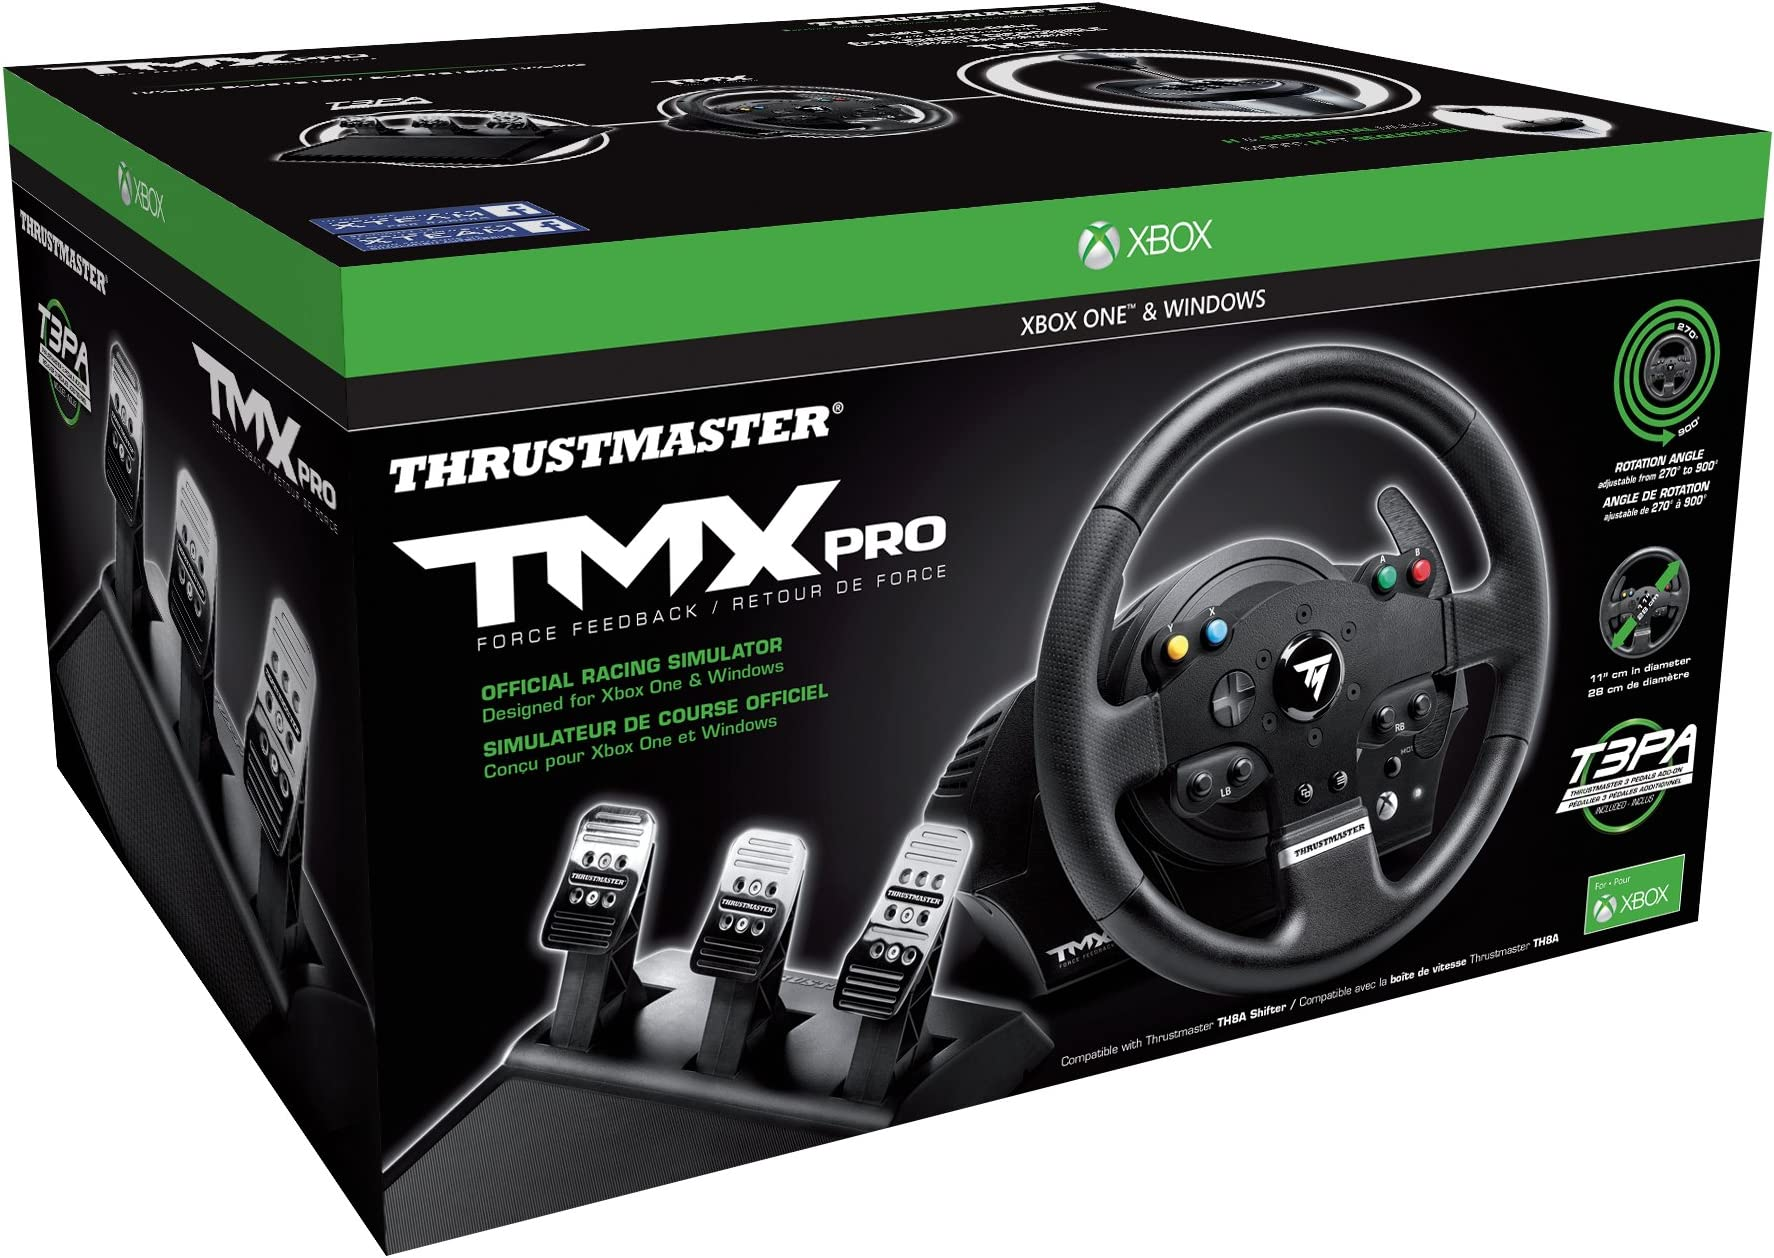 Amazon com: Thrustmaster TMX PRO Racing Wheel: xbox one: Video Games